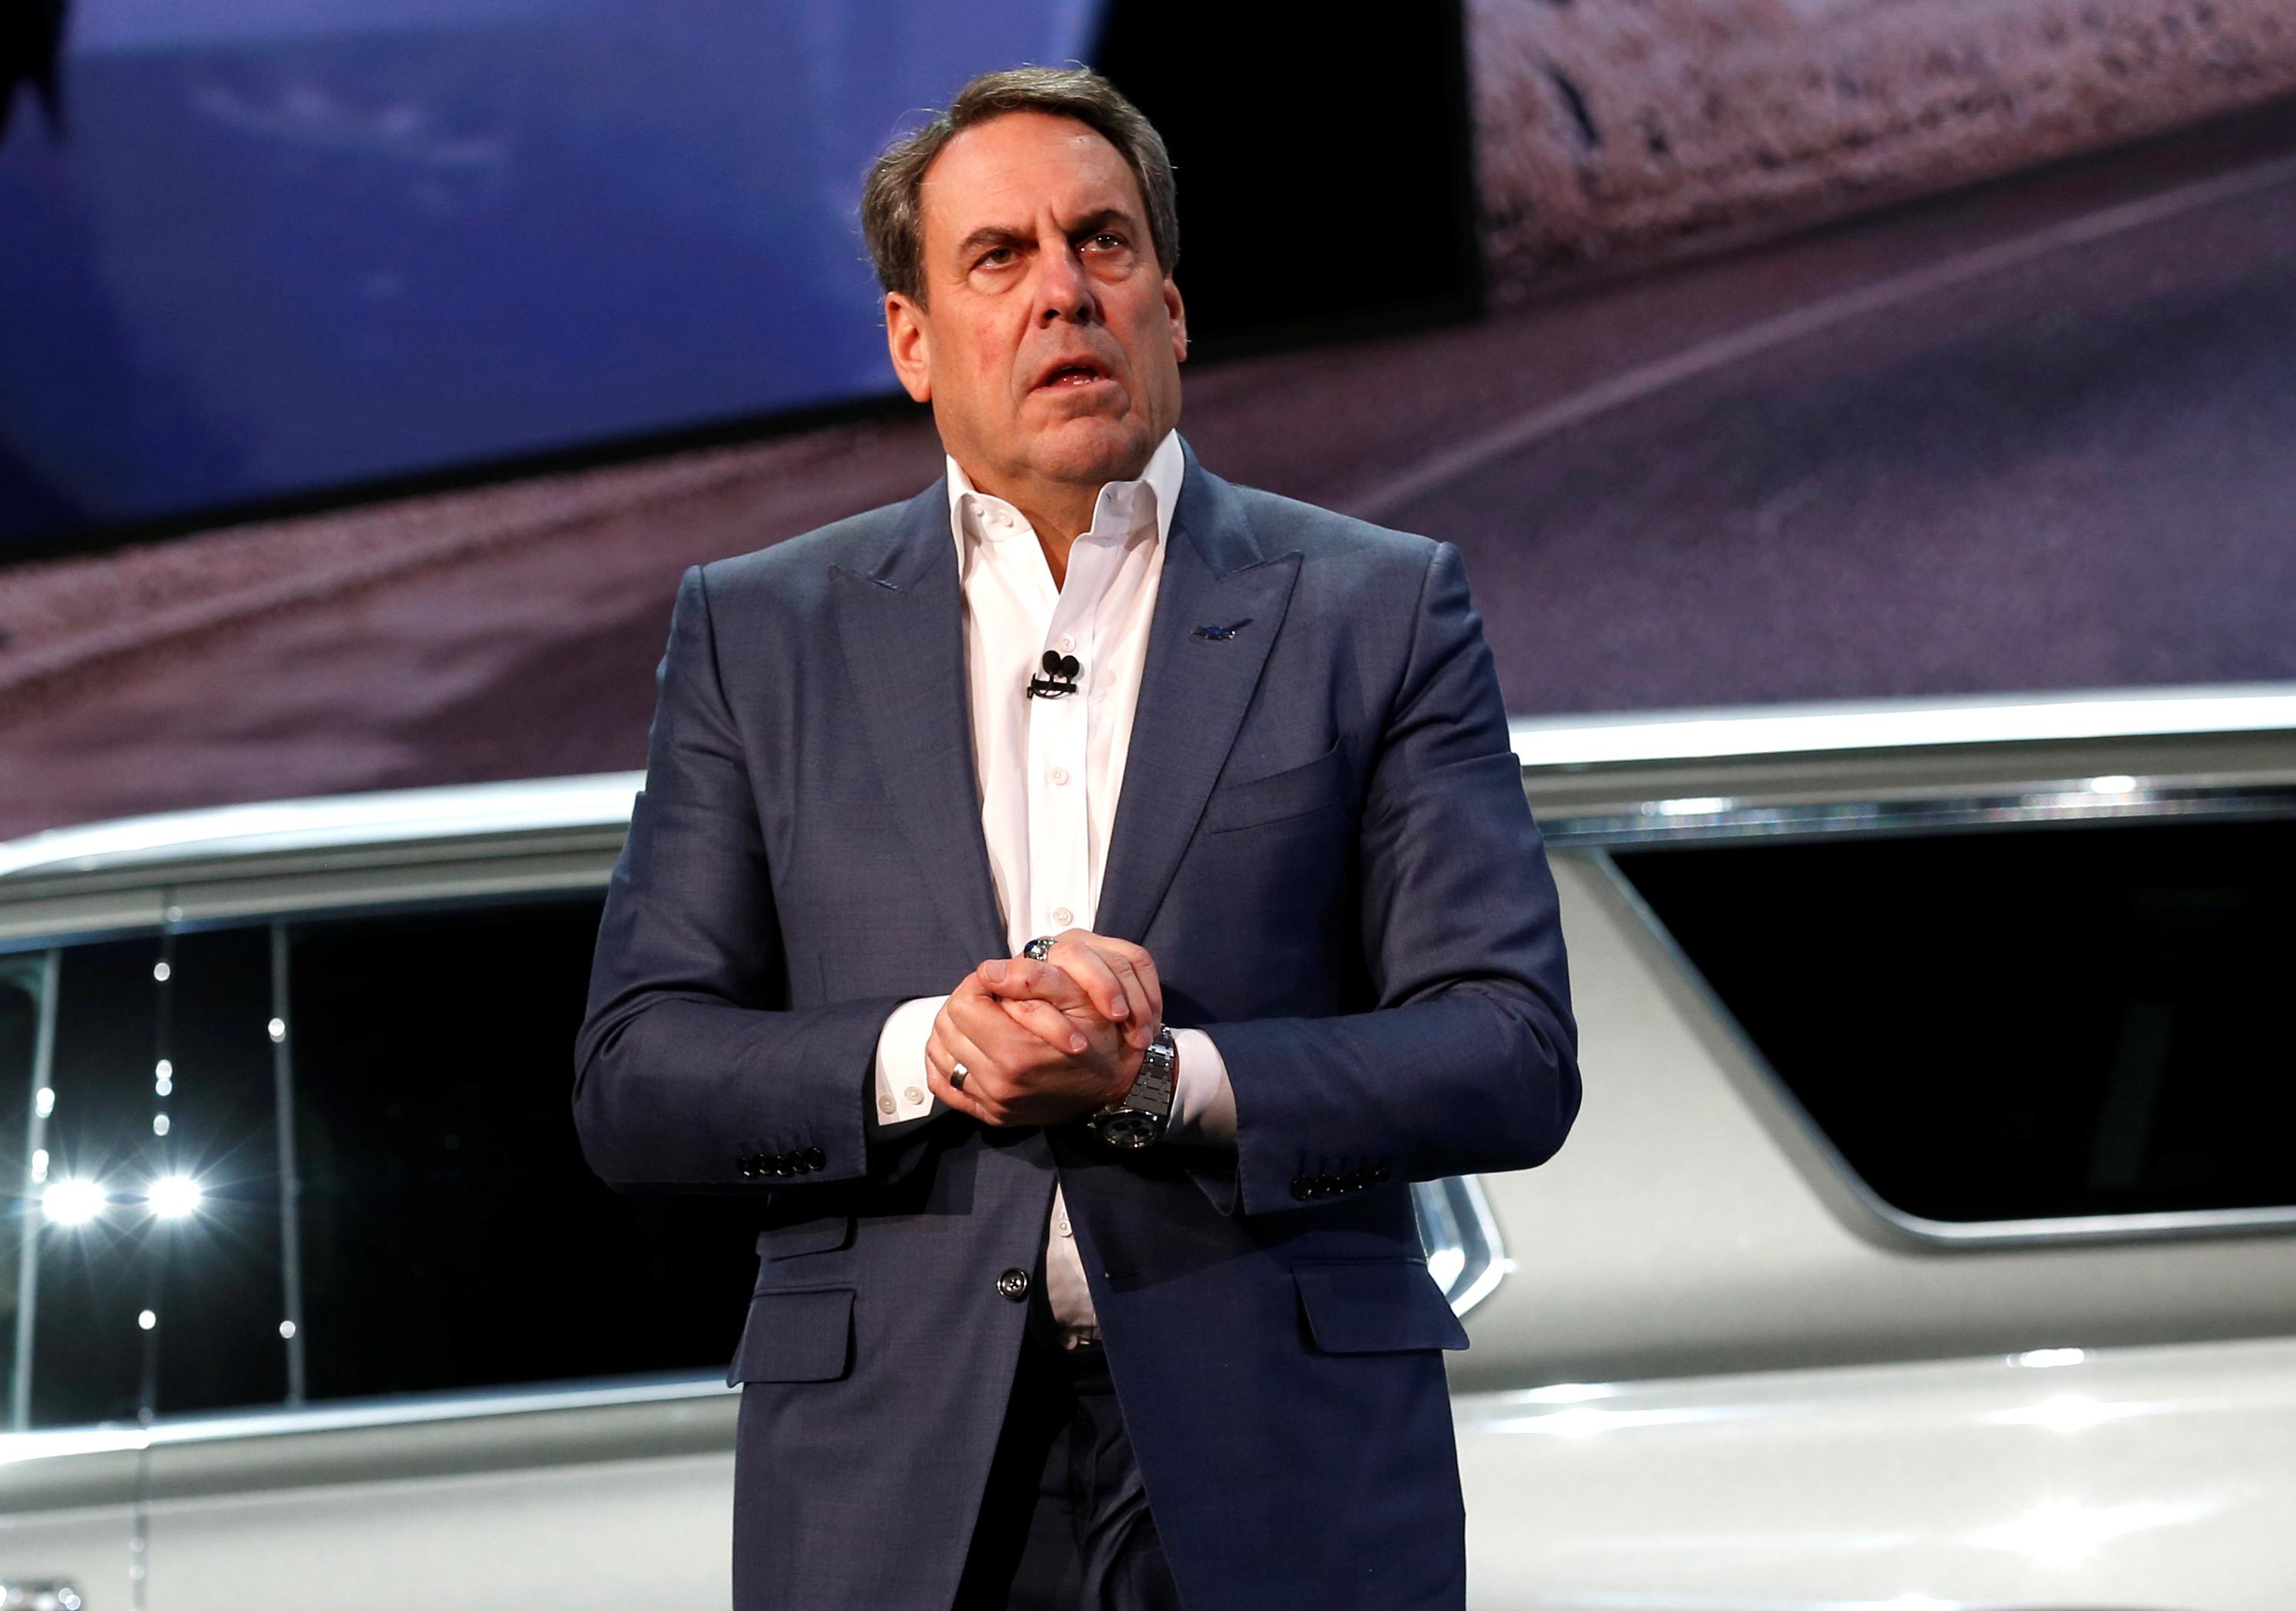 General Motors President Mark Reuss talks about the Chevrolet 2021 Suburban and Tahoe SUVs in Detroit, Michigan, U.S. December 10, 2019. REUTERS/Rebecca Cook